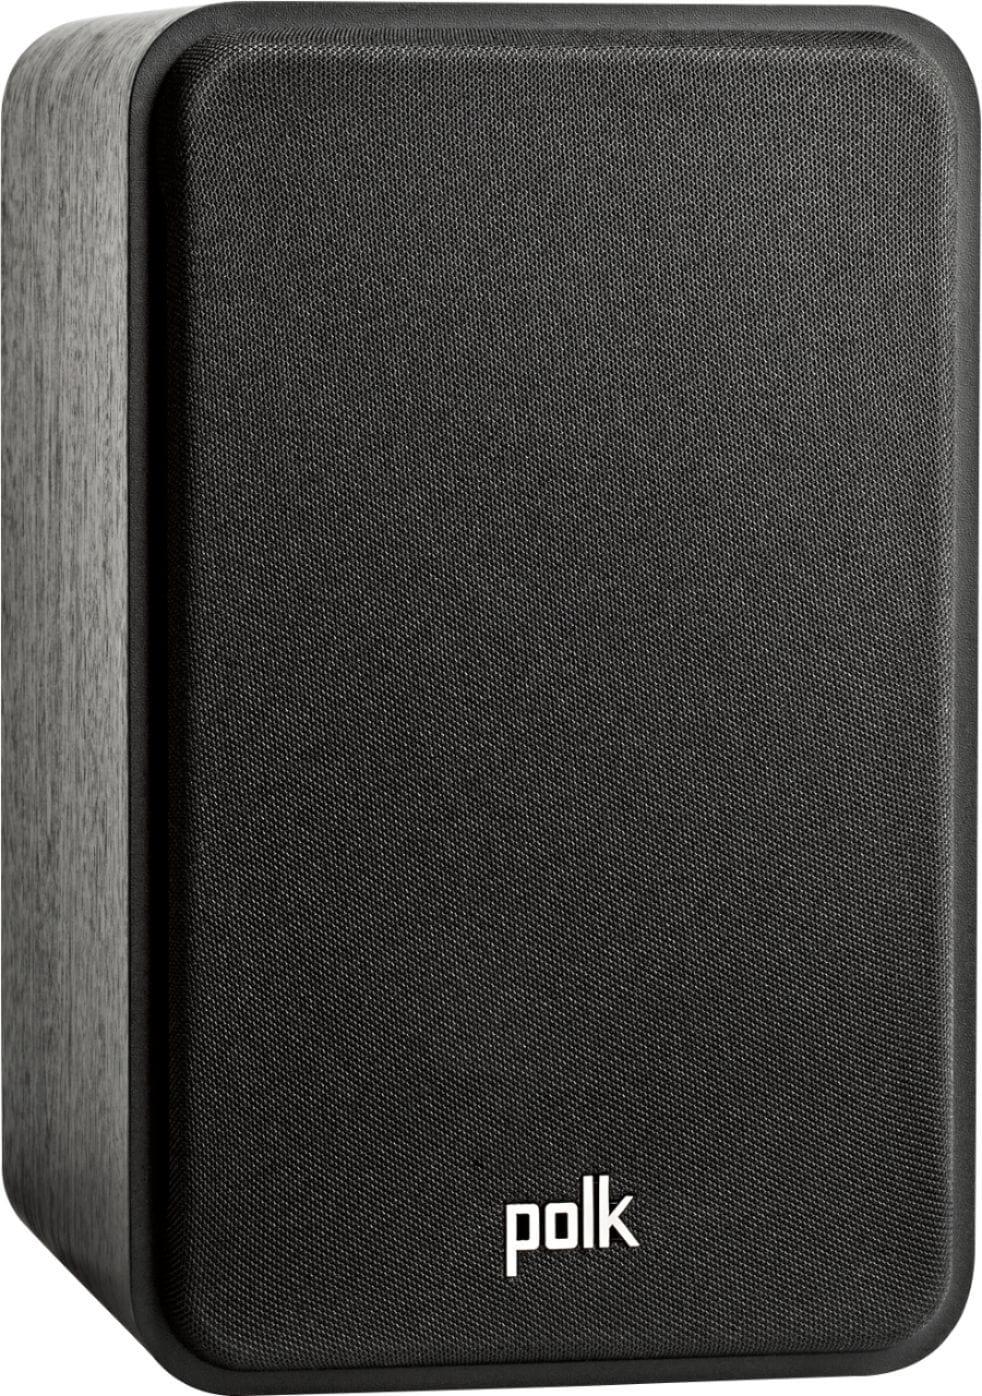 Polk Signature Series Speakers for Elevated Listening